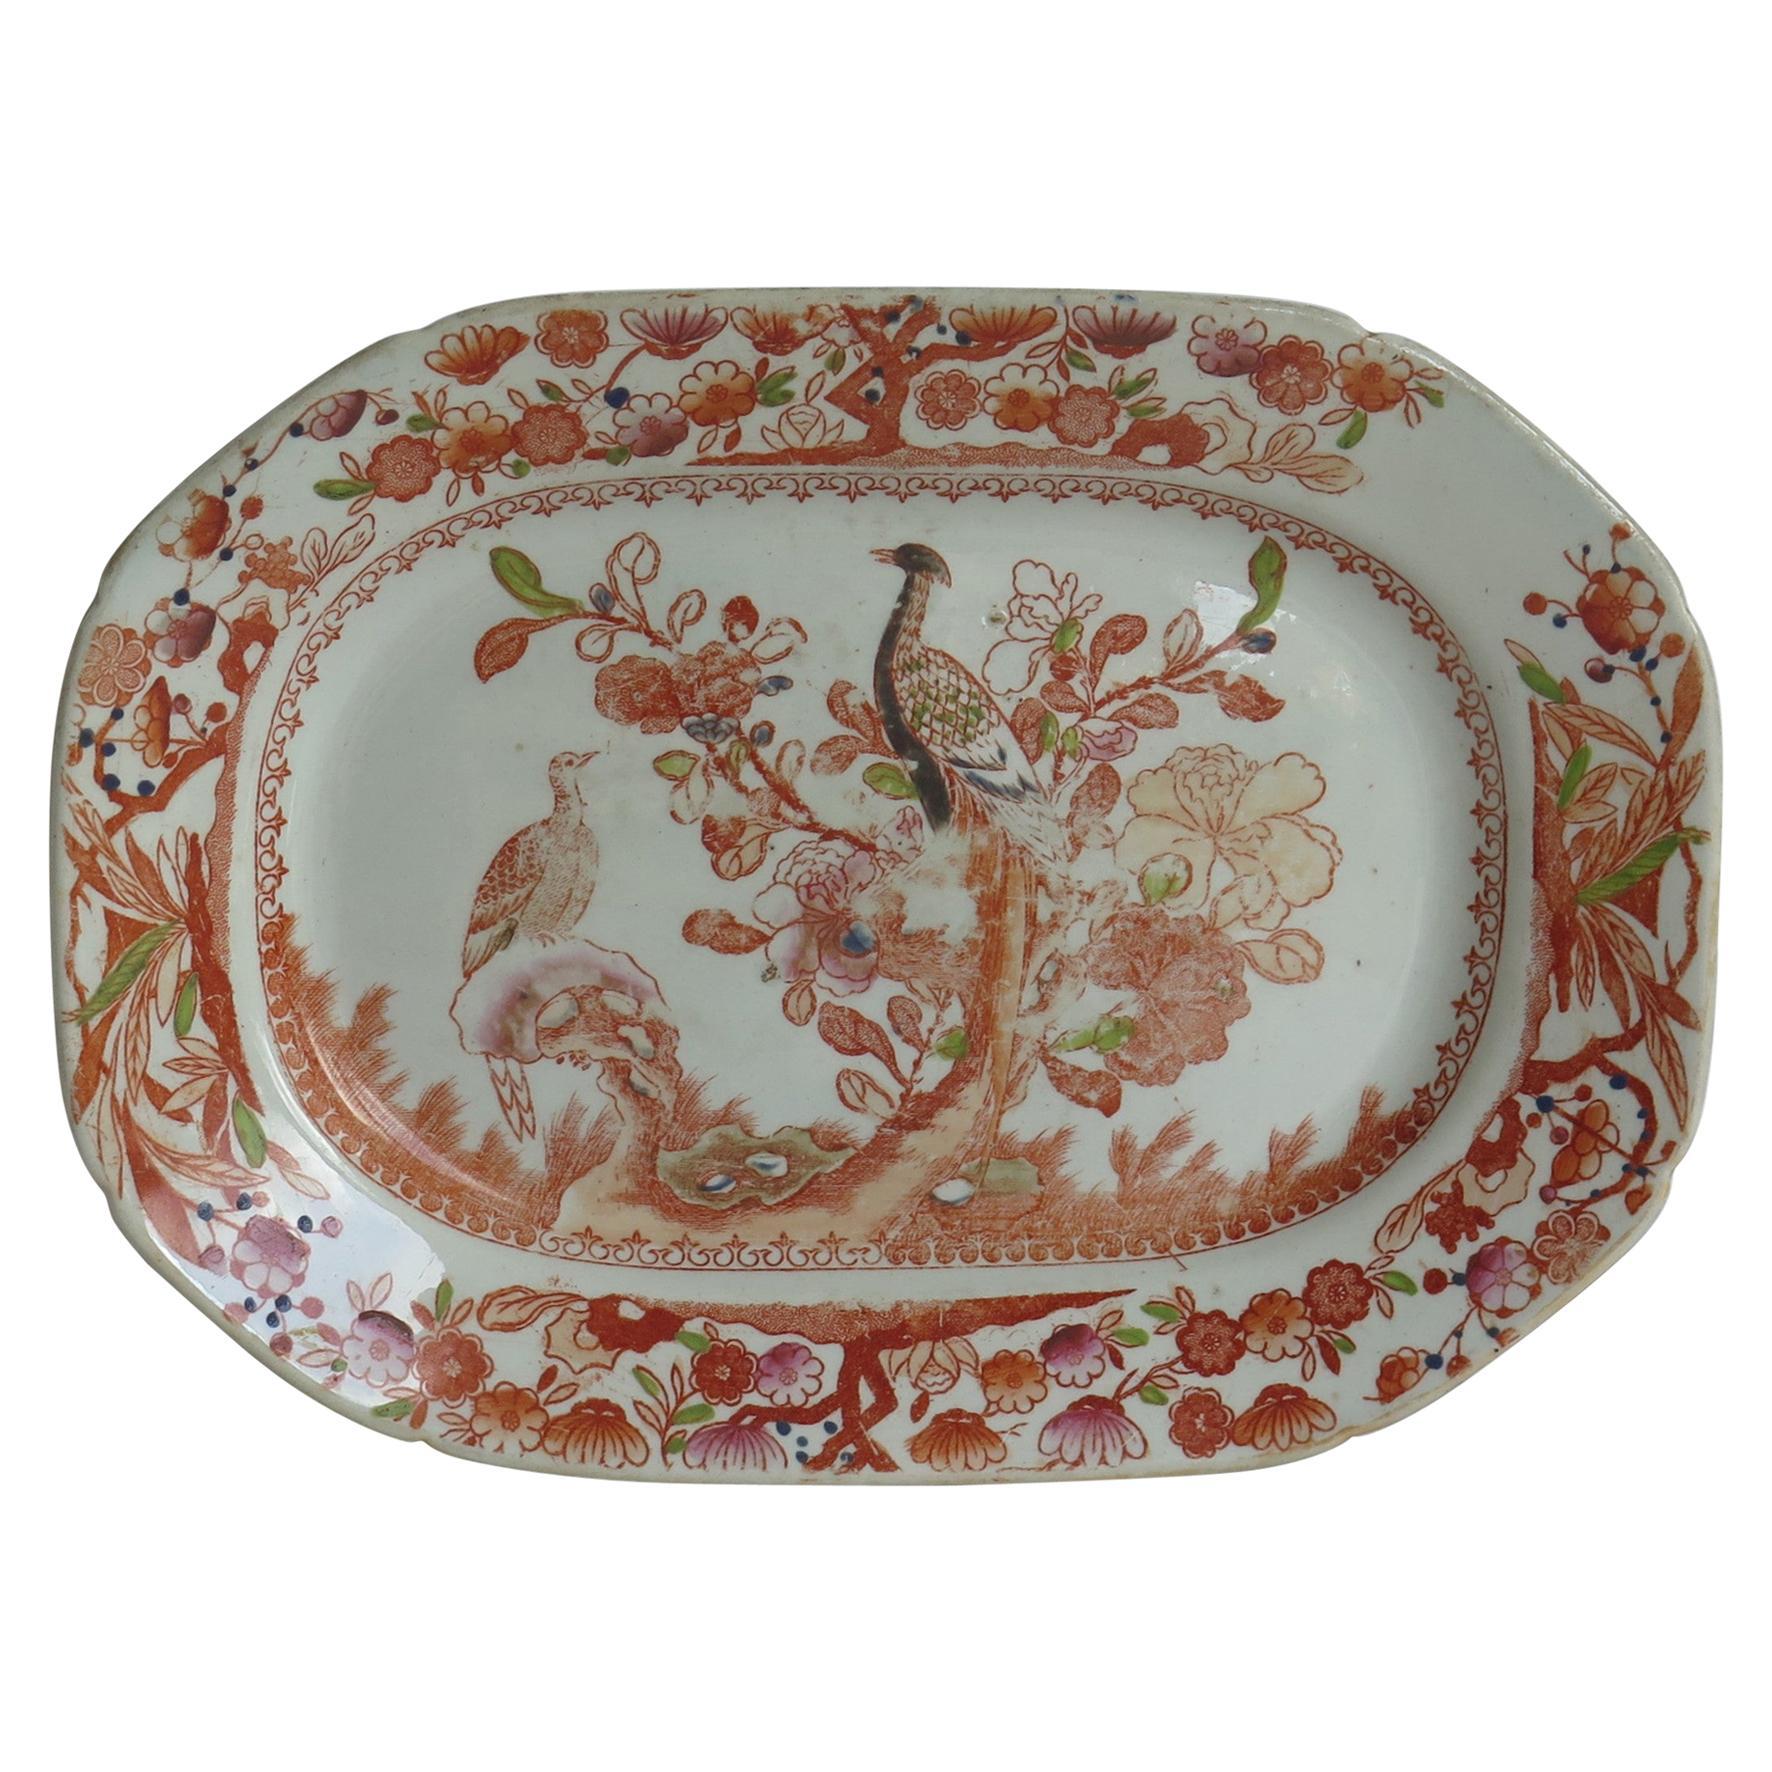 Georgian Mason's Ironstone Platter or Plate in Oriental Pheasant Ptn, circa 1818